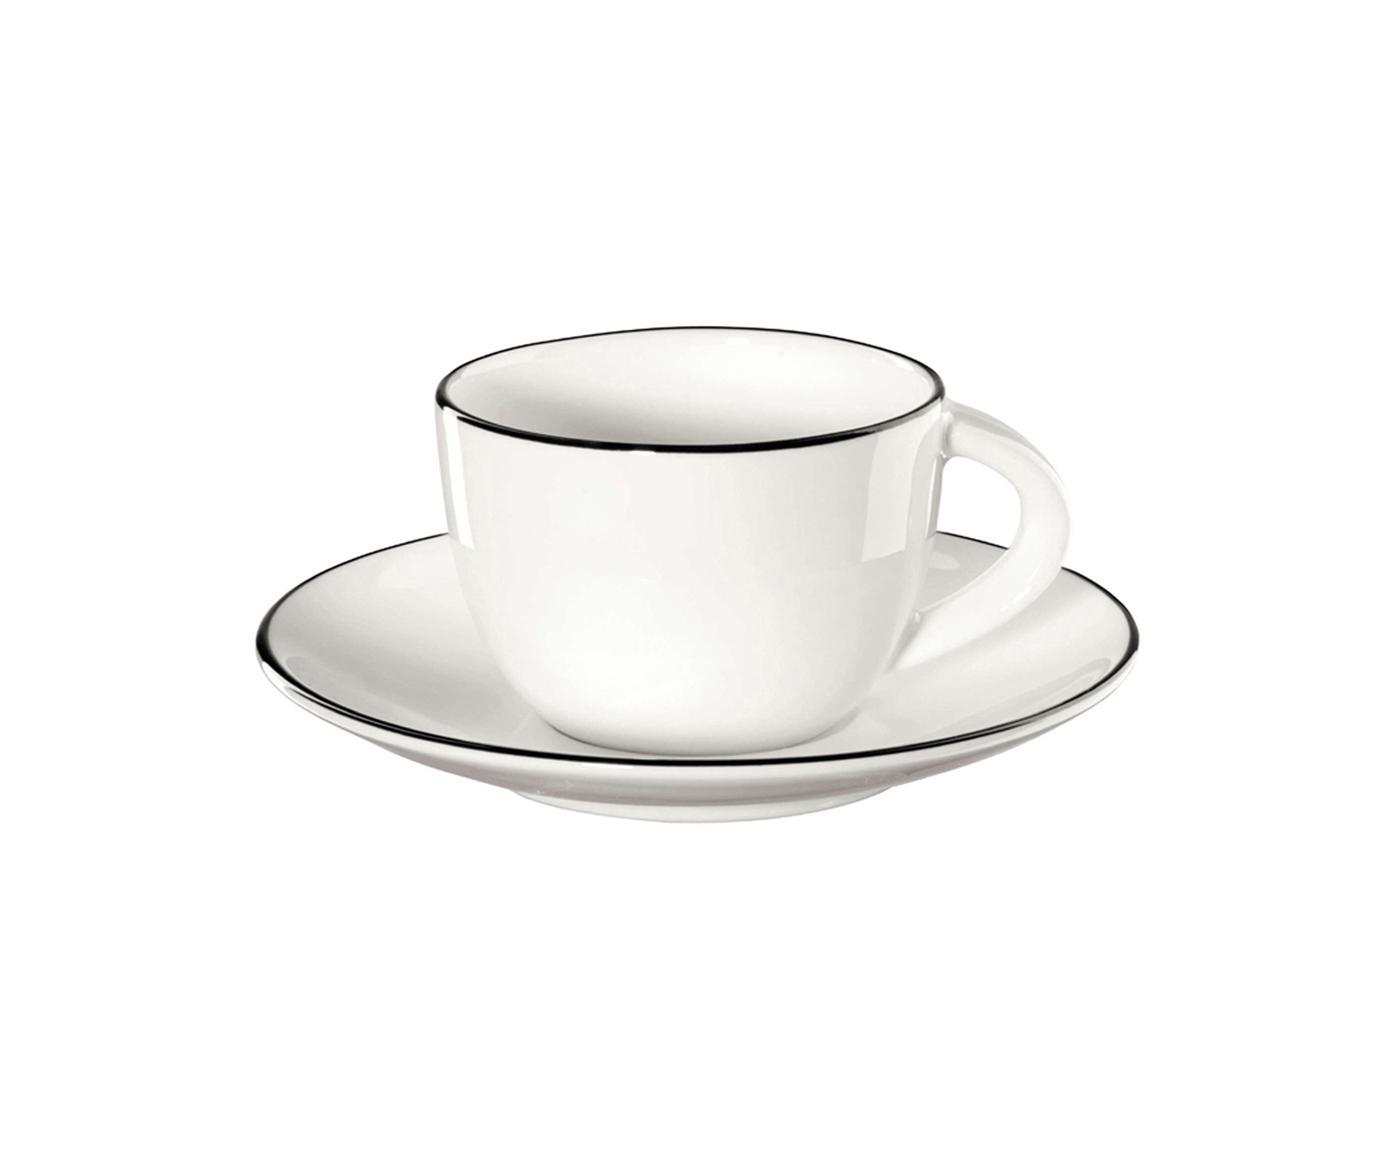 Set tazzine caffè da tavola ligne noir 8 pz, Porcellana Fine Bone China, Bianco Bordo: nero, Ø 6 x Alt. 5 cm